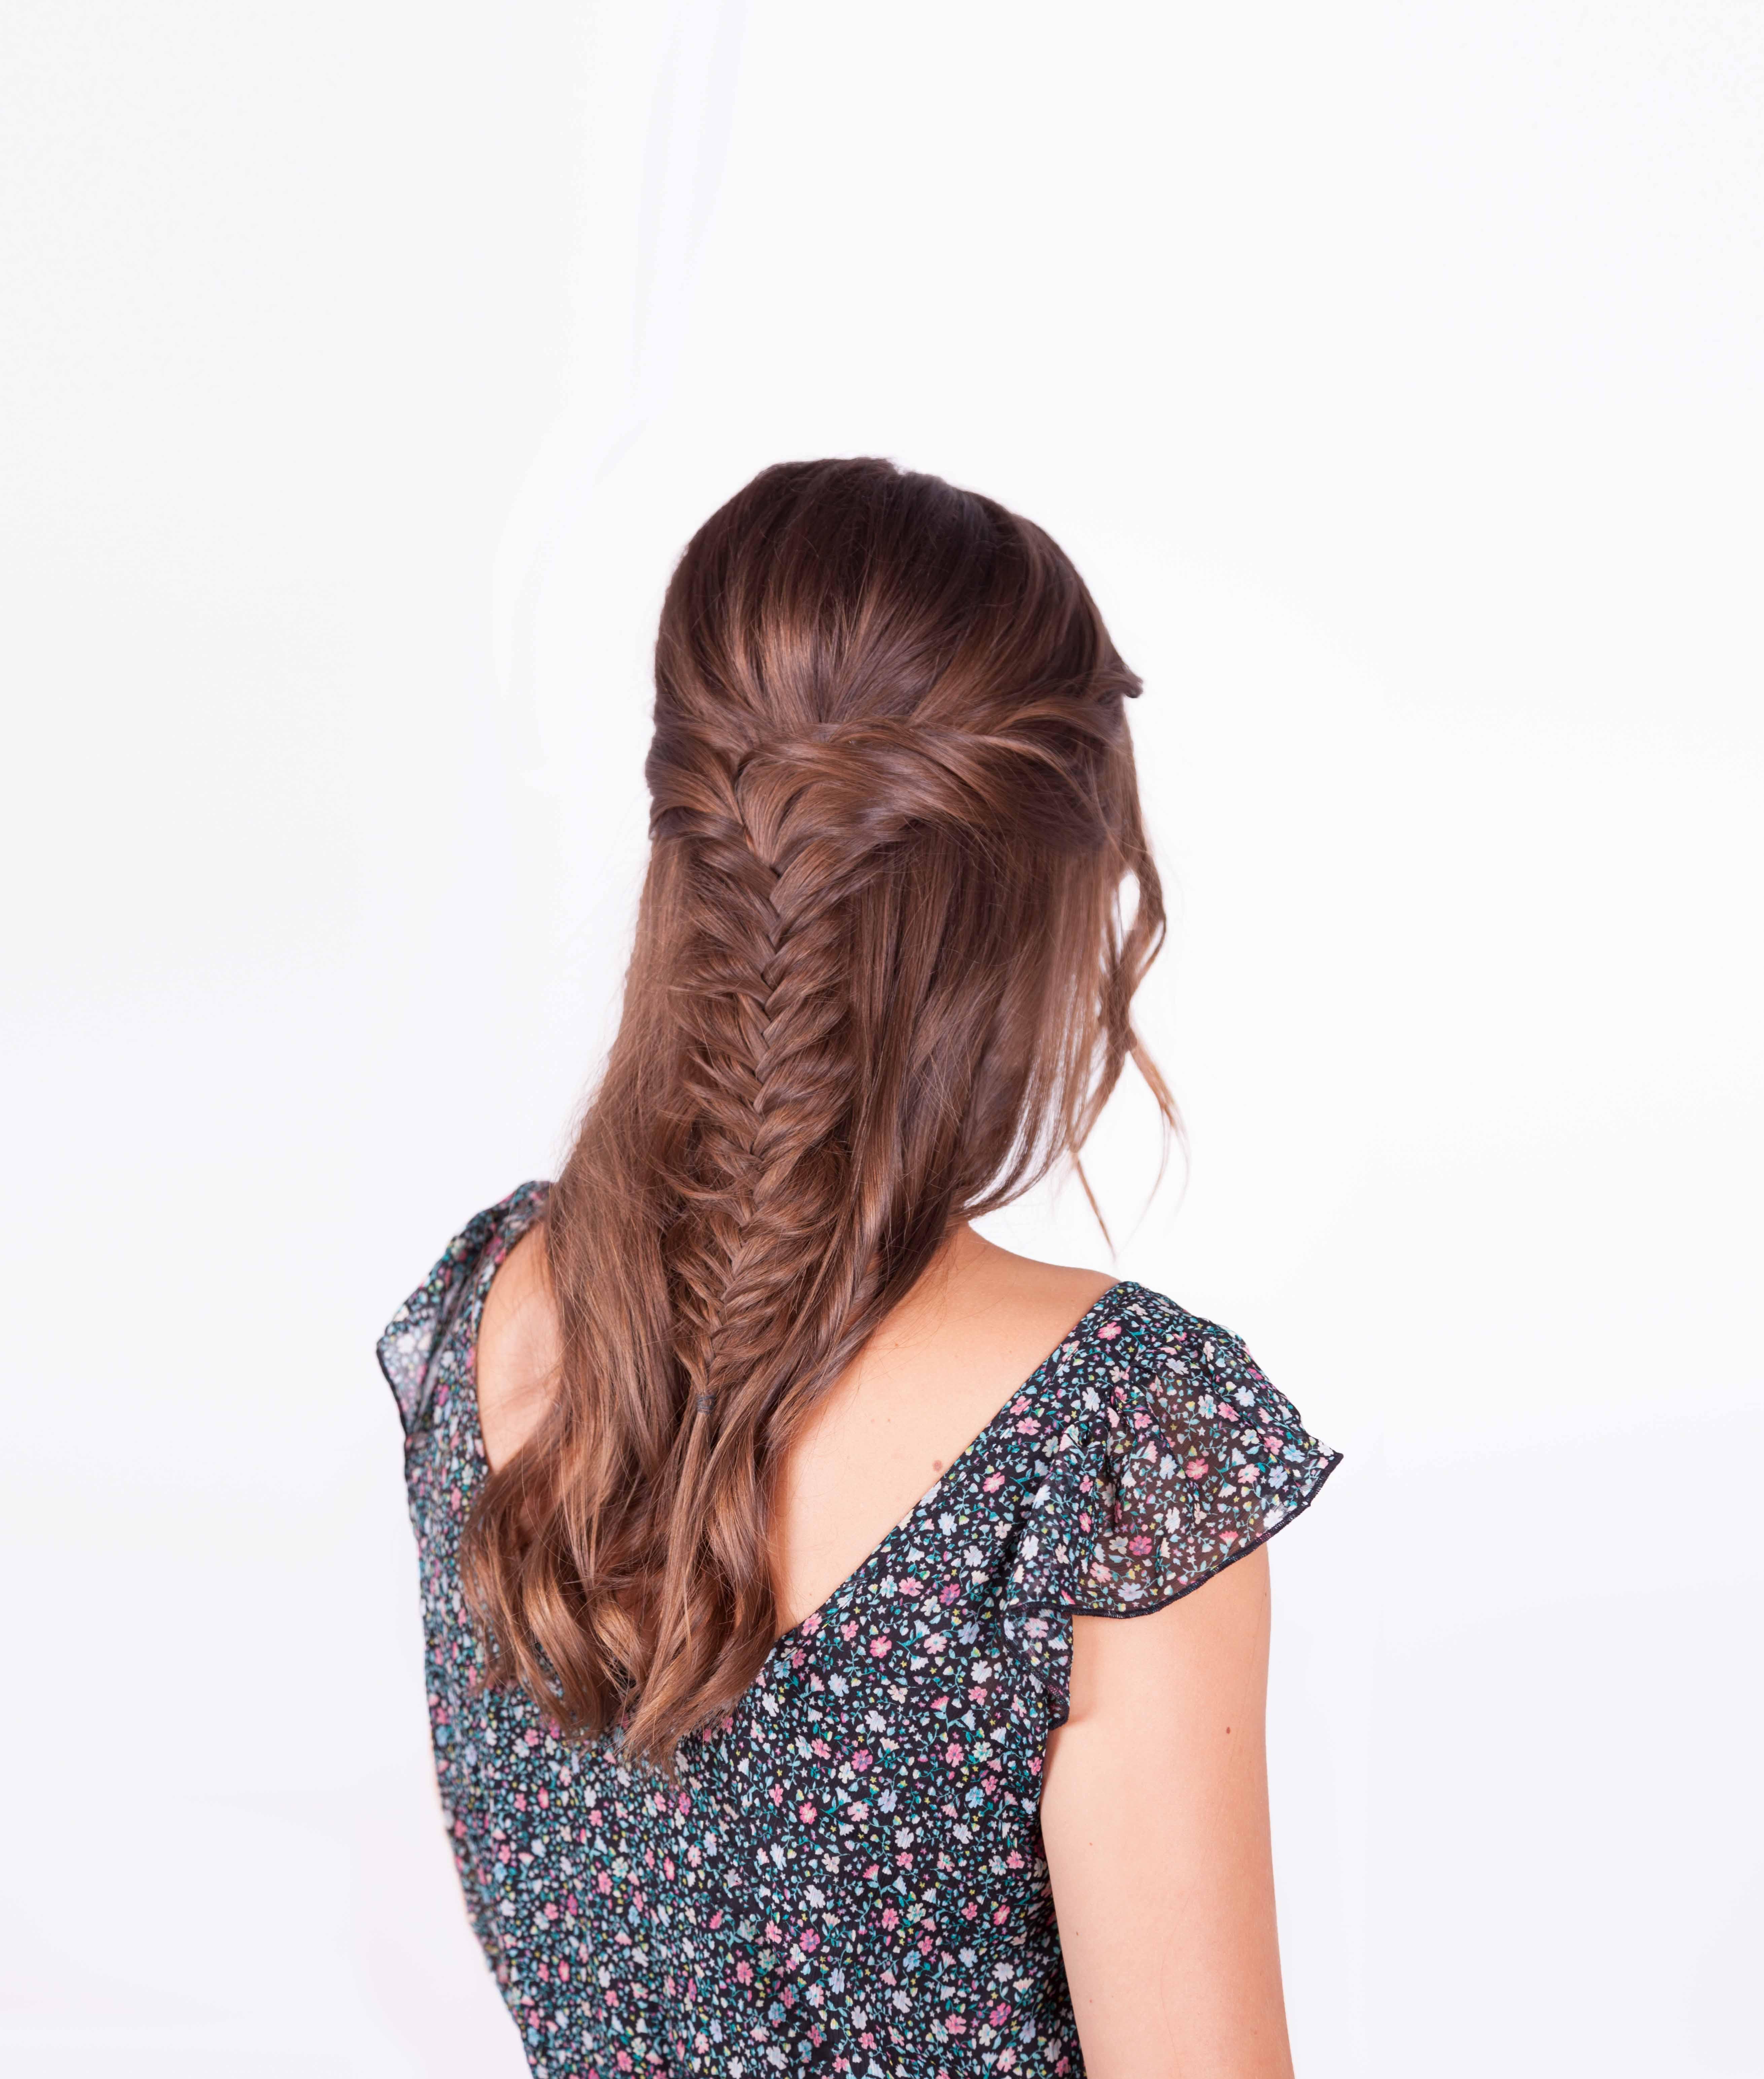 _MG_6012test cheveux-Modifier-Modifier